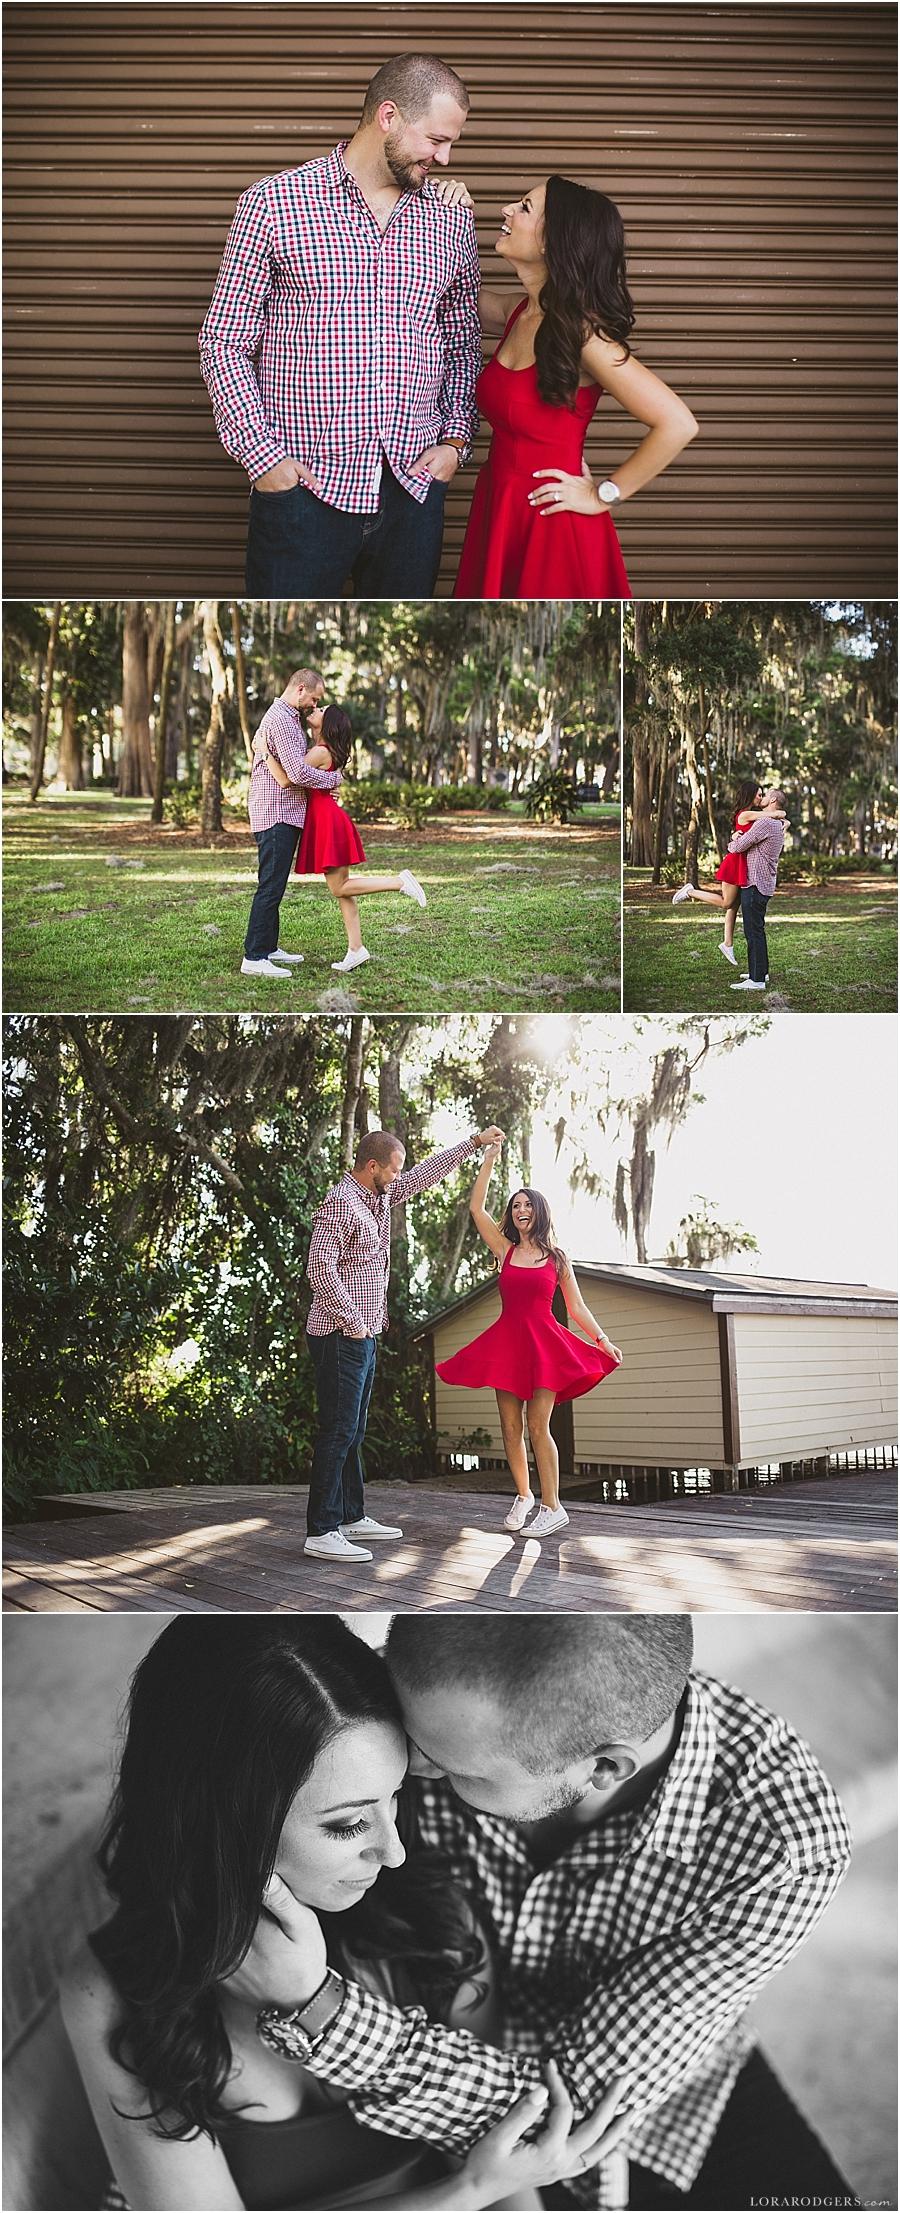 Kraft_Azalea_Engagement_Winter_Park_Florida_002